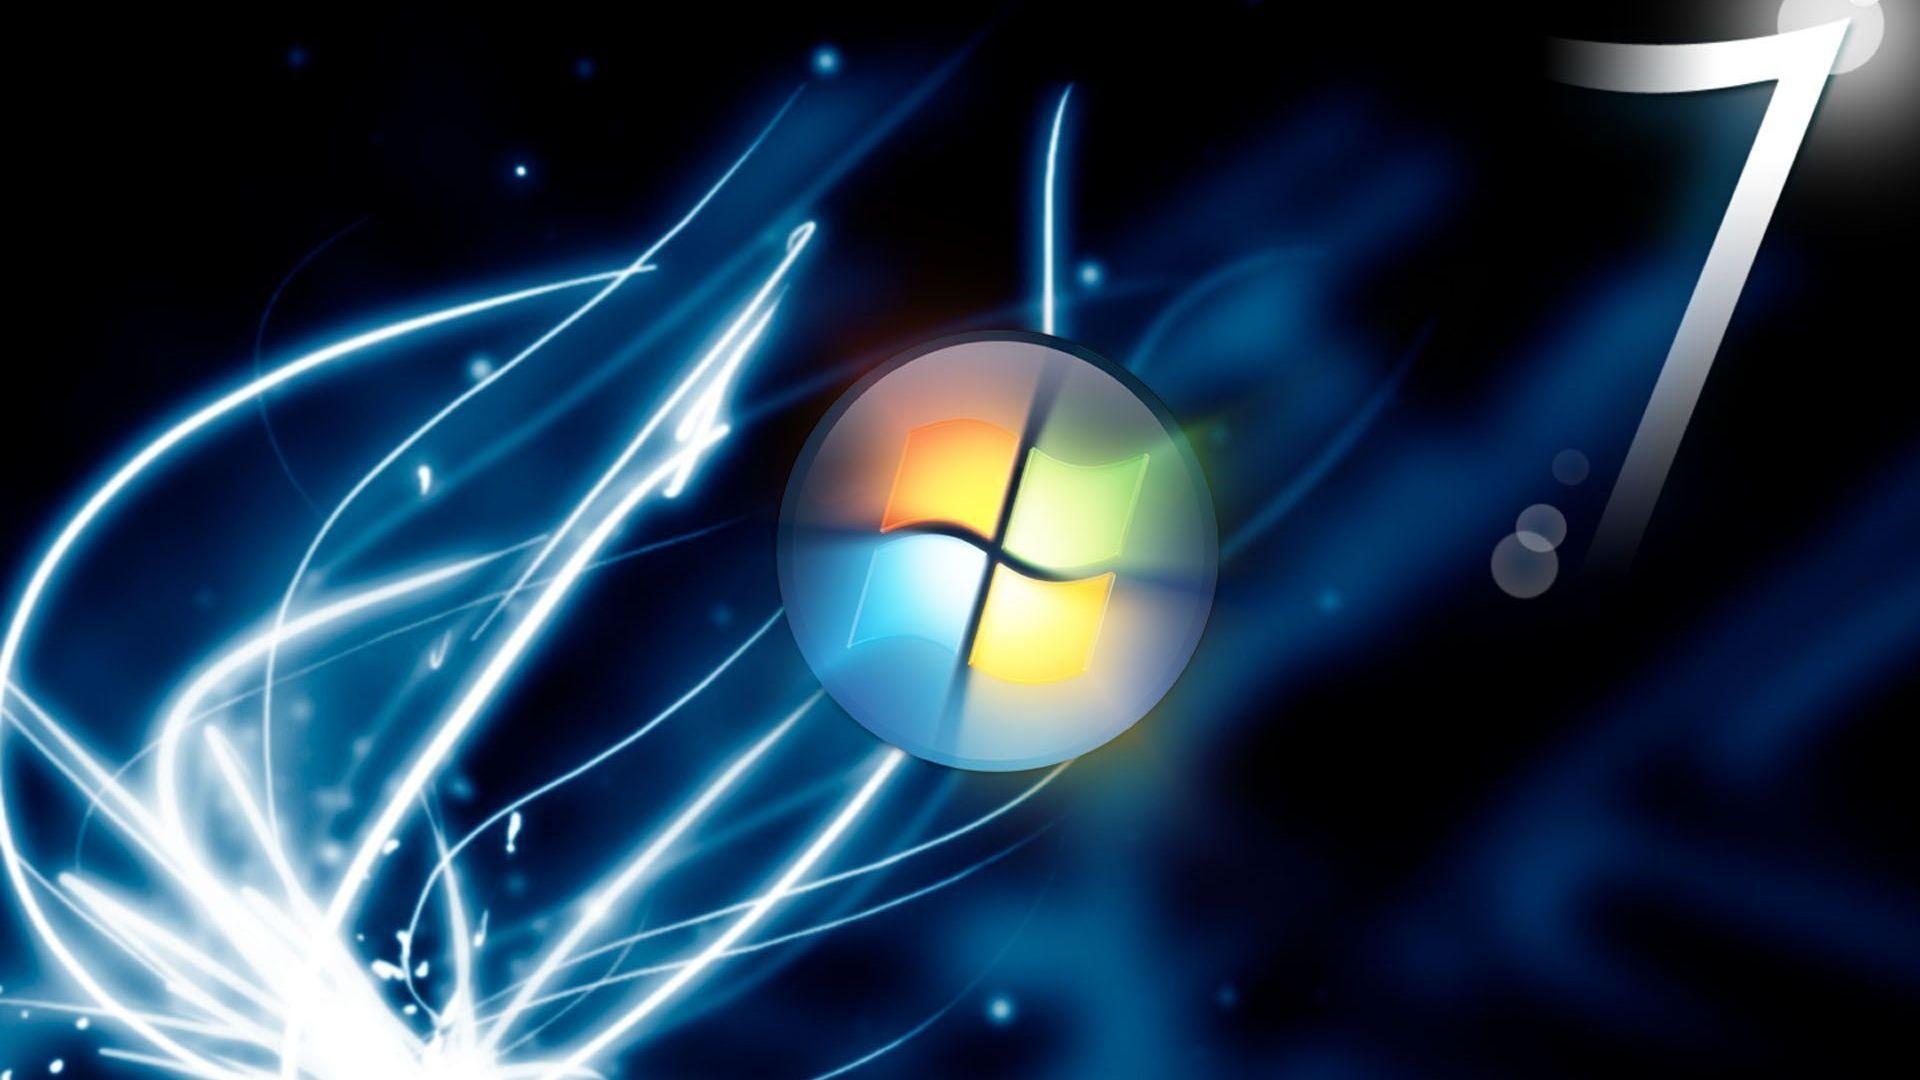 Desktop Hd Laptop Windows 7 Wallpapers Wallpaper Cave